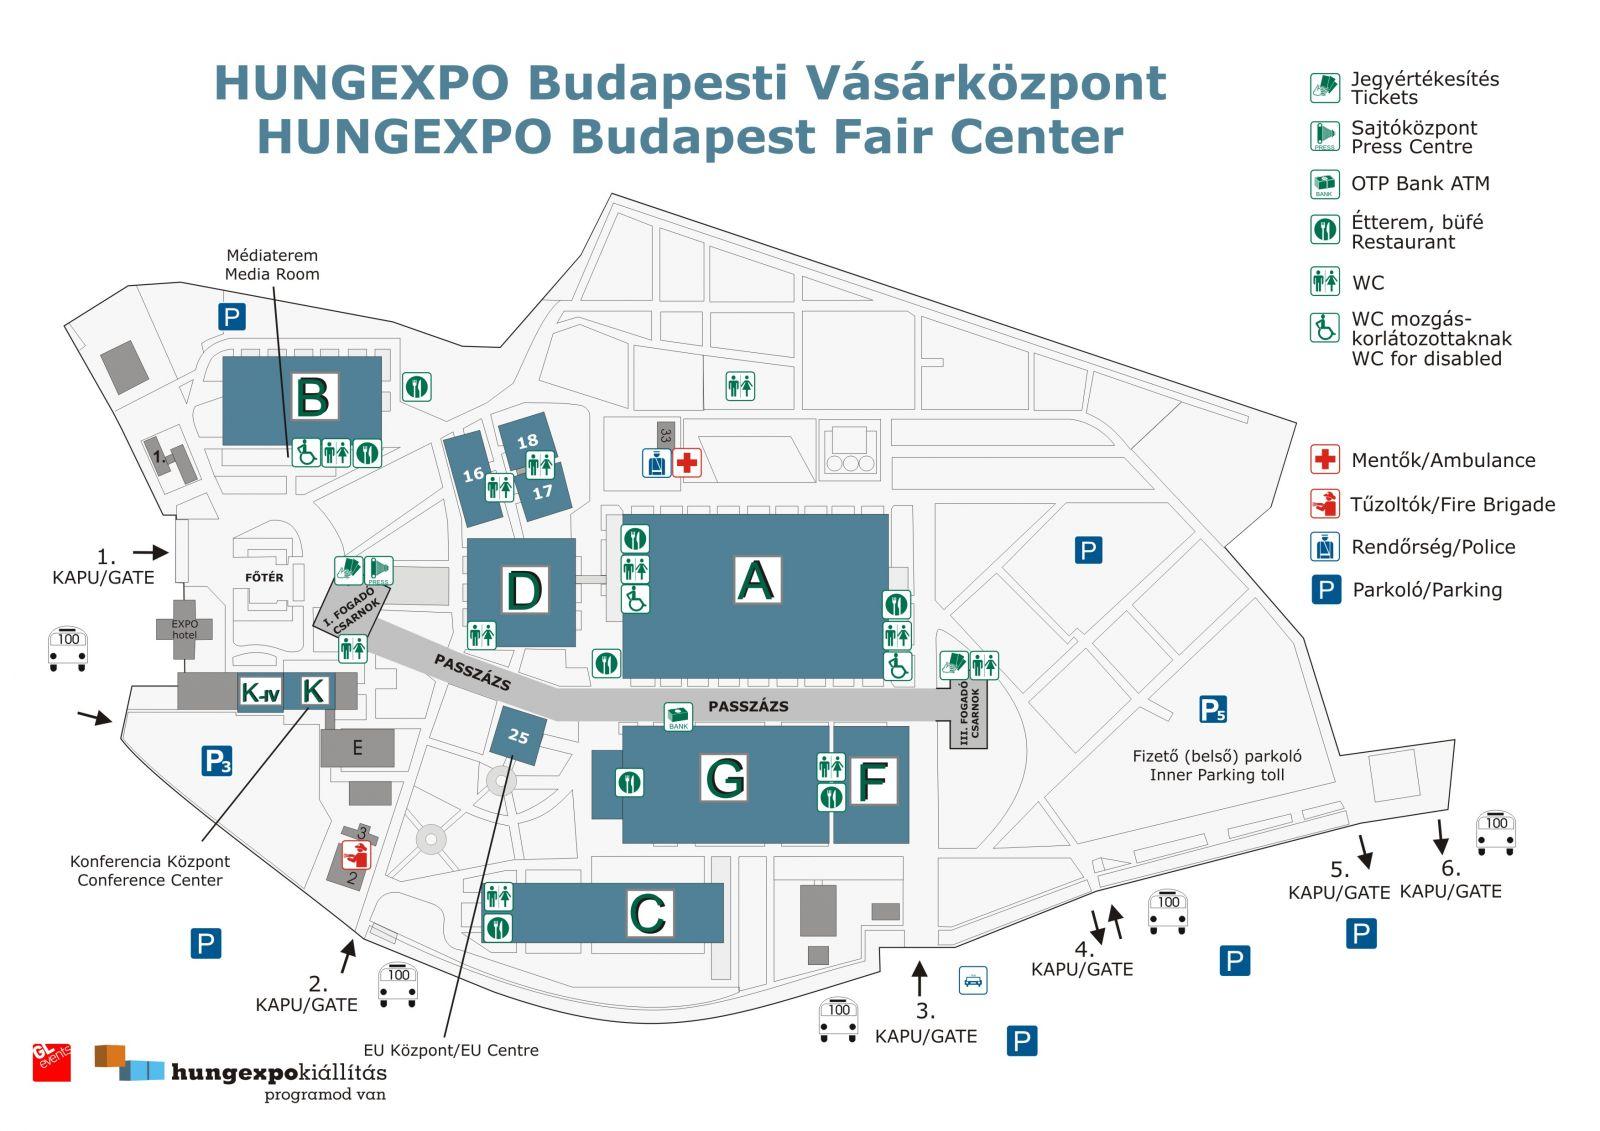 hungexpo térkép budapest Hungexpo   Budapesti Vásárközpont , Budapest   Helyszín  hungexpo térkép budapest